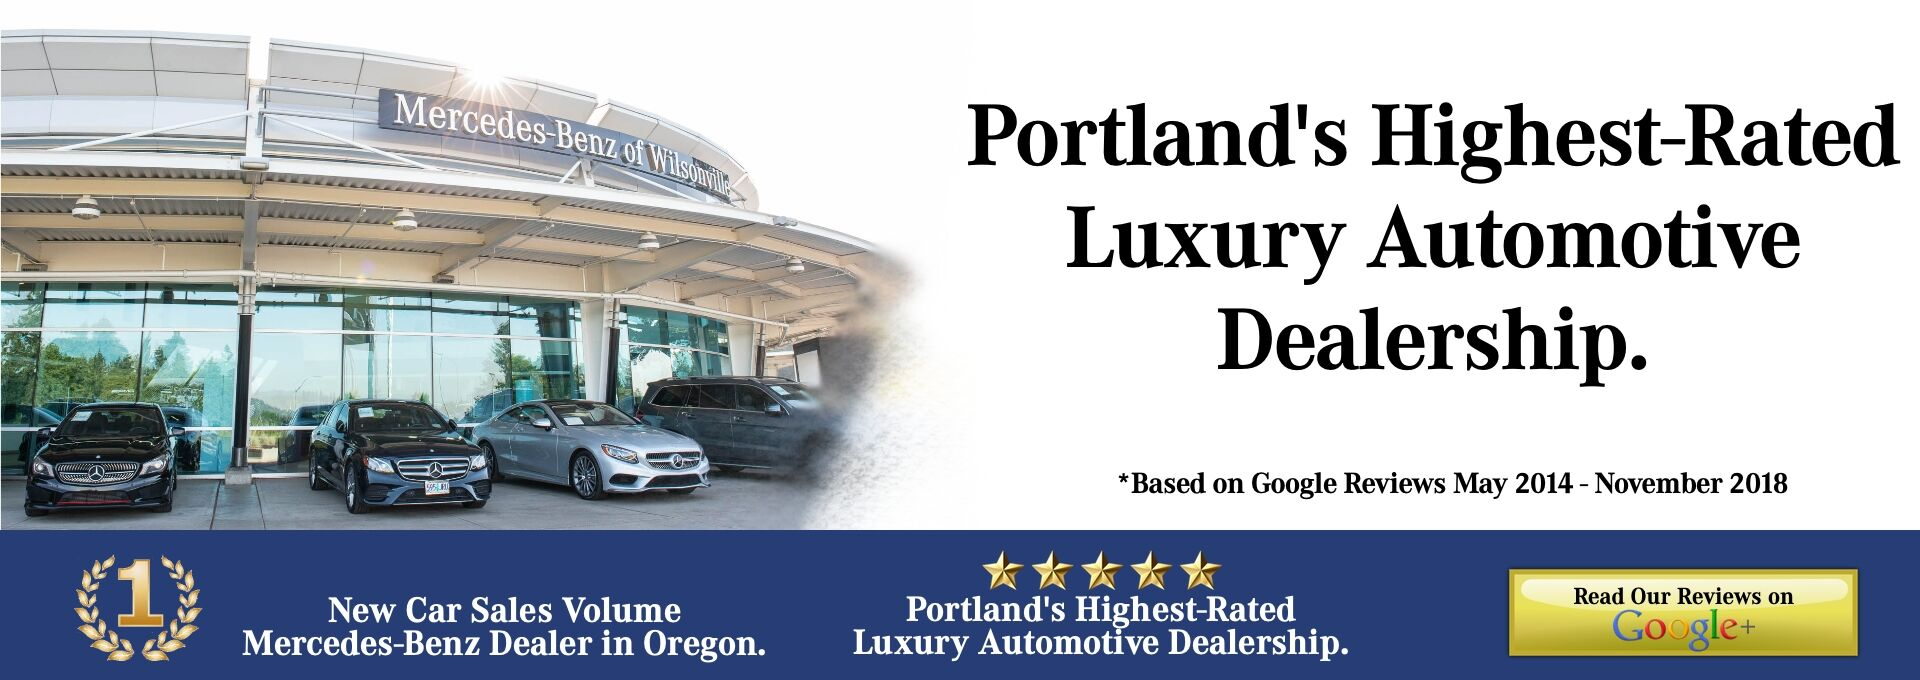 Mercedes-Benz Dealership Portland OR Used Cars Mercedes ...